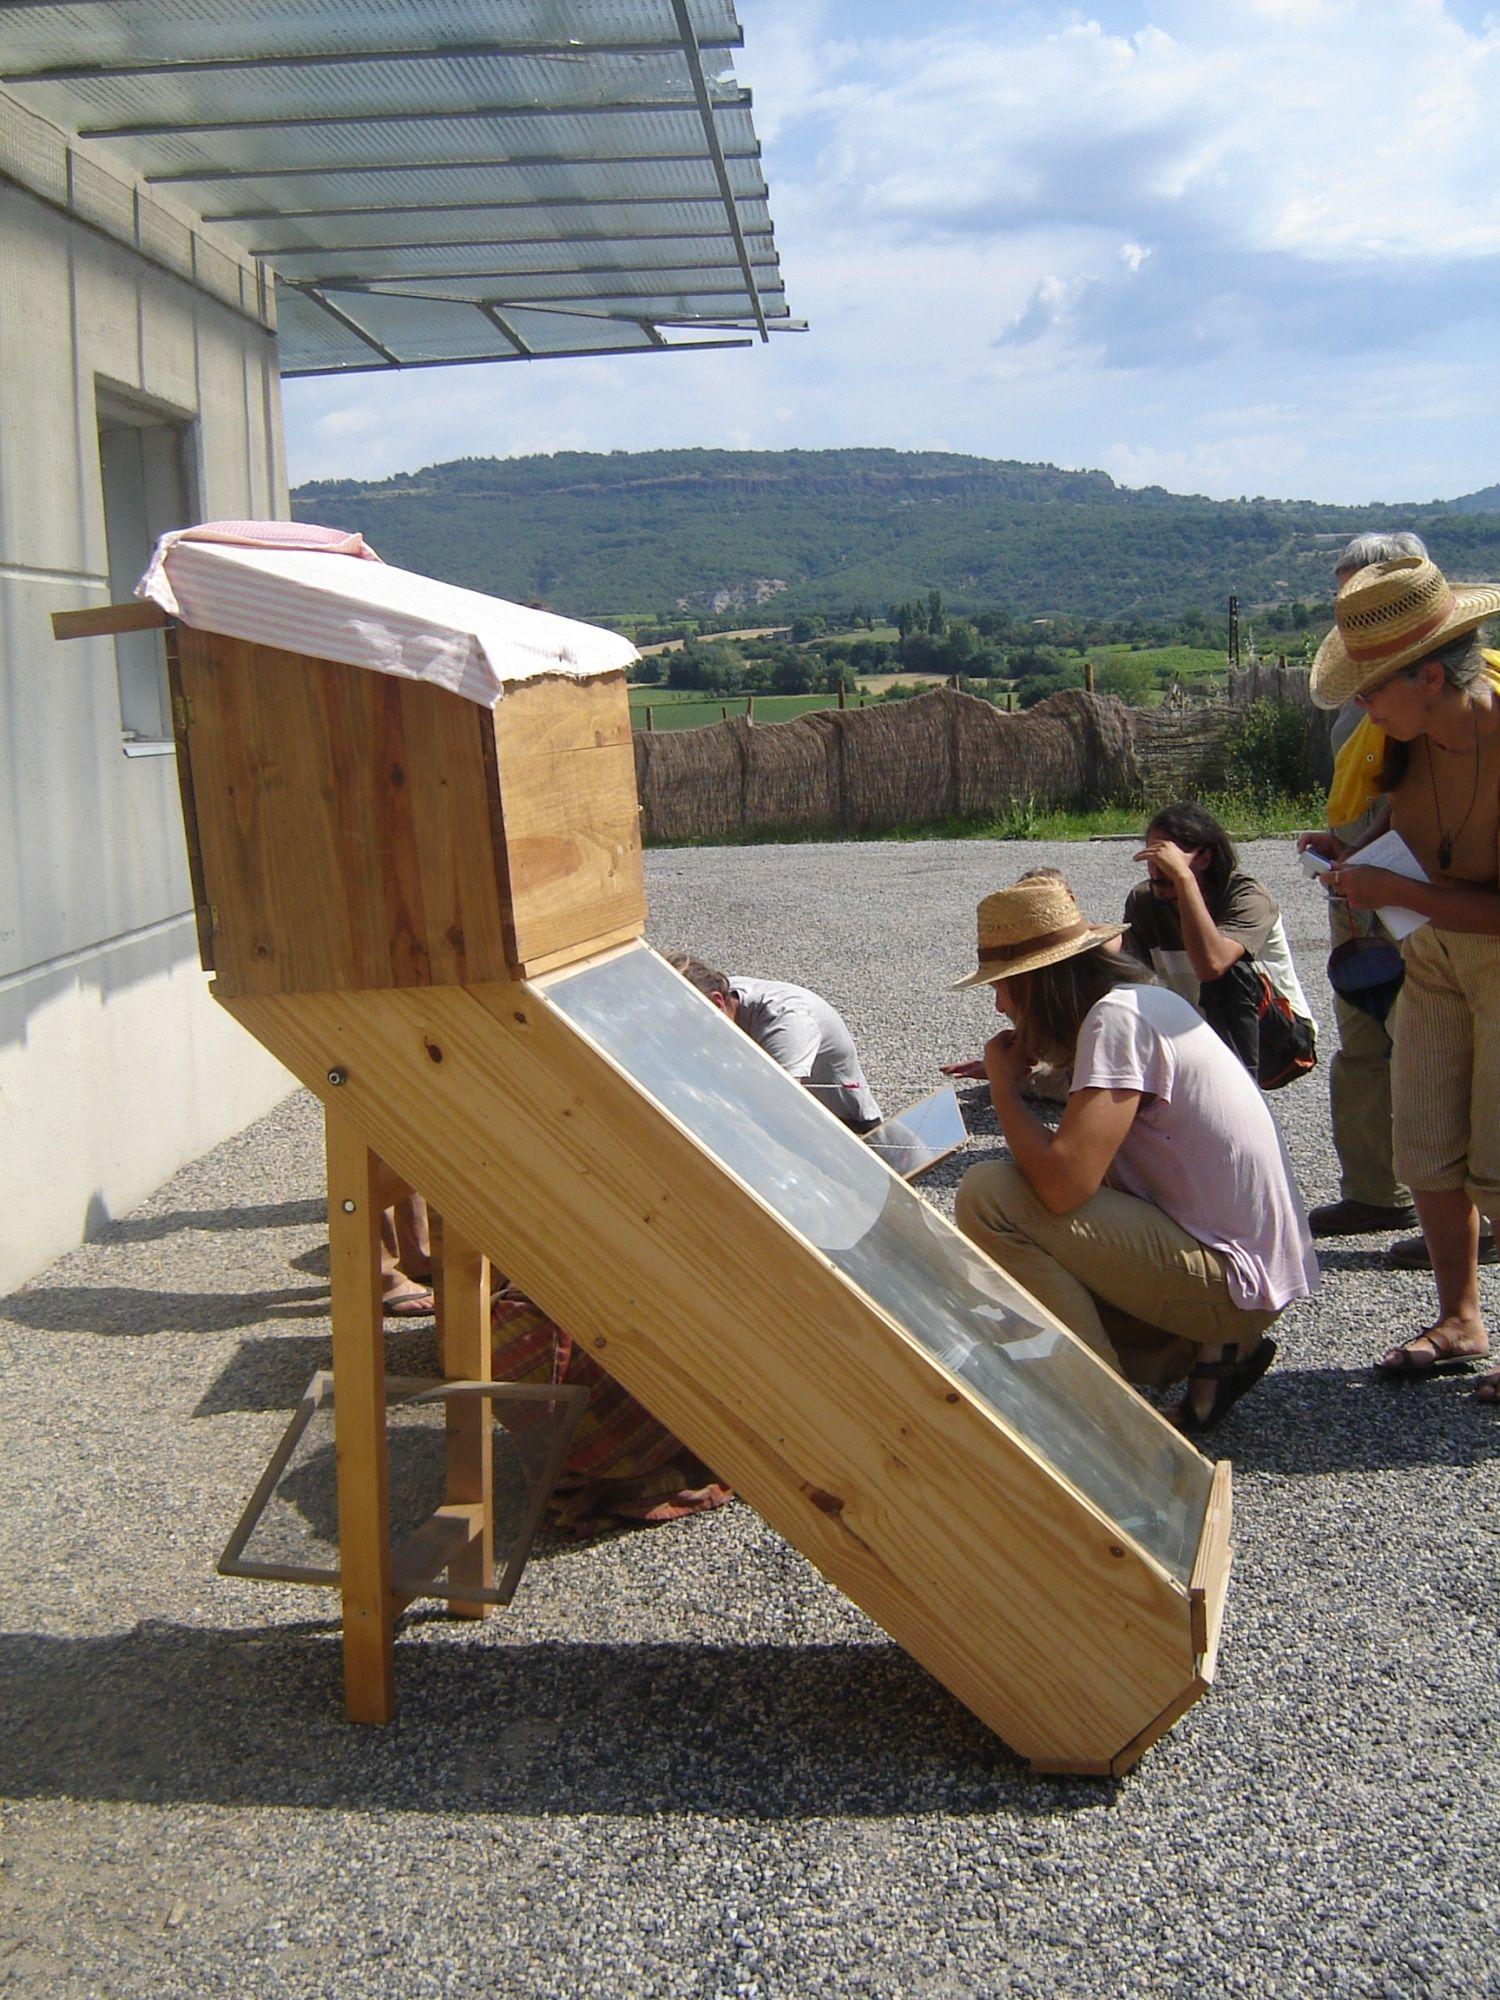 four et s choir solaire solar construction and solar power. Black Bedroom Furniture Sets. Home Design Ideas